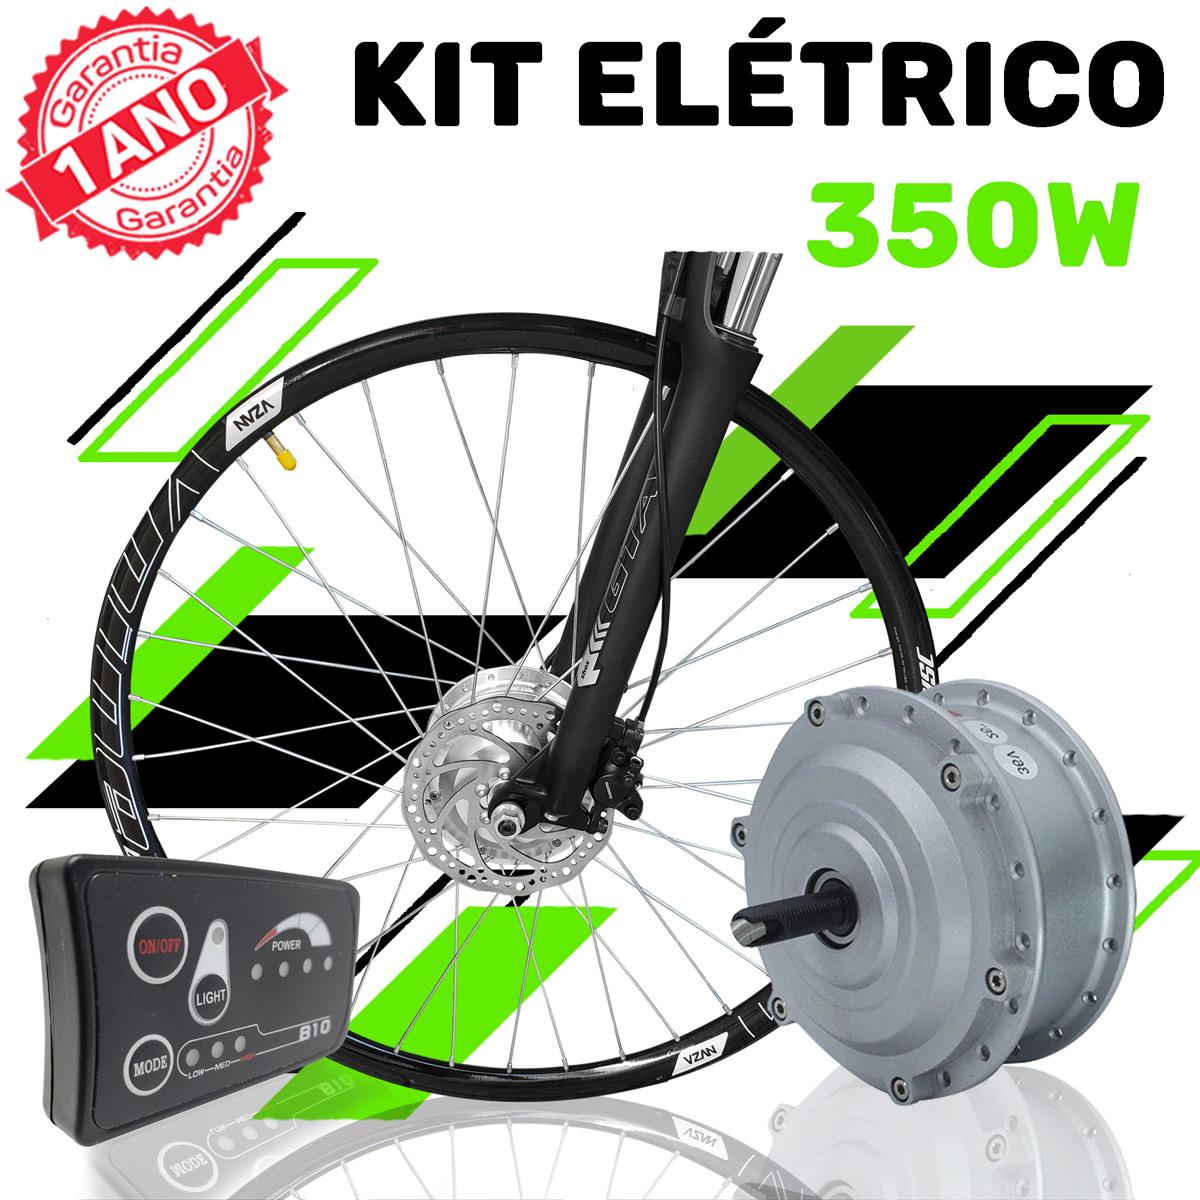 Kit Elétrico para Bicicleta - TecBike - 350 Watts 36V - Aro 27,5